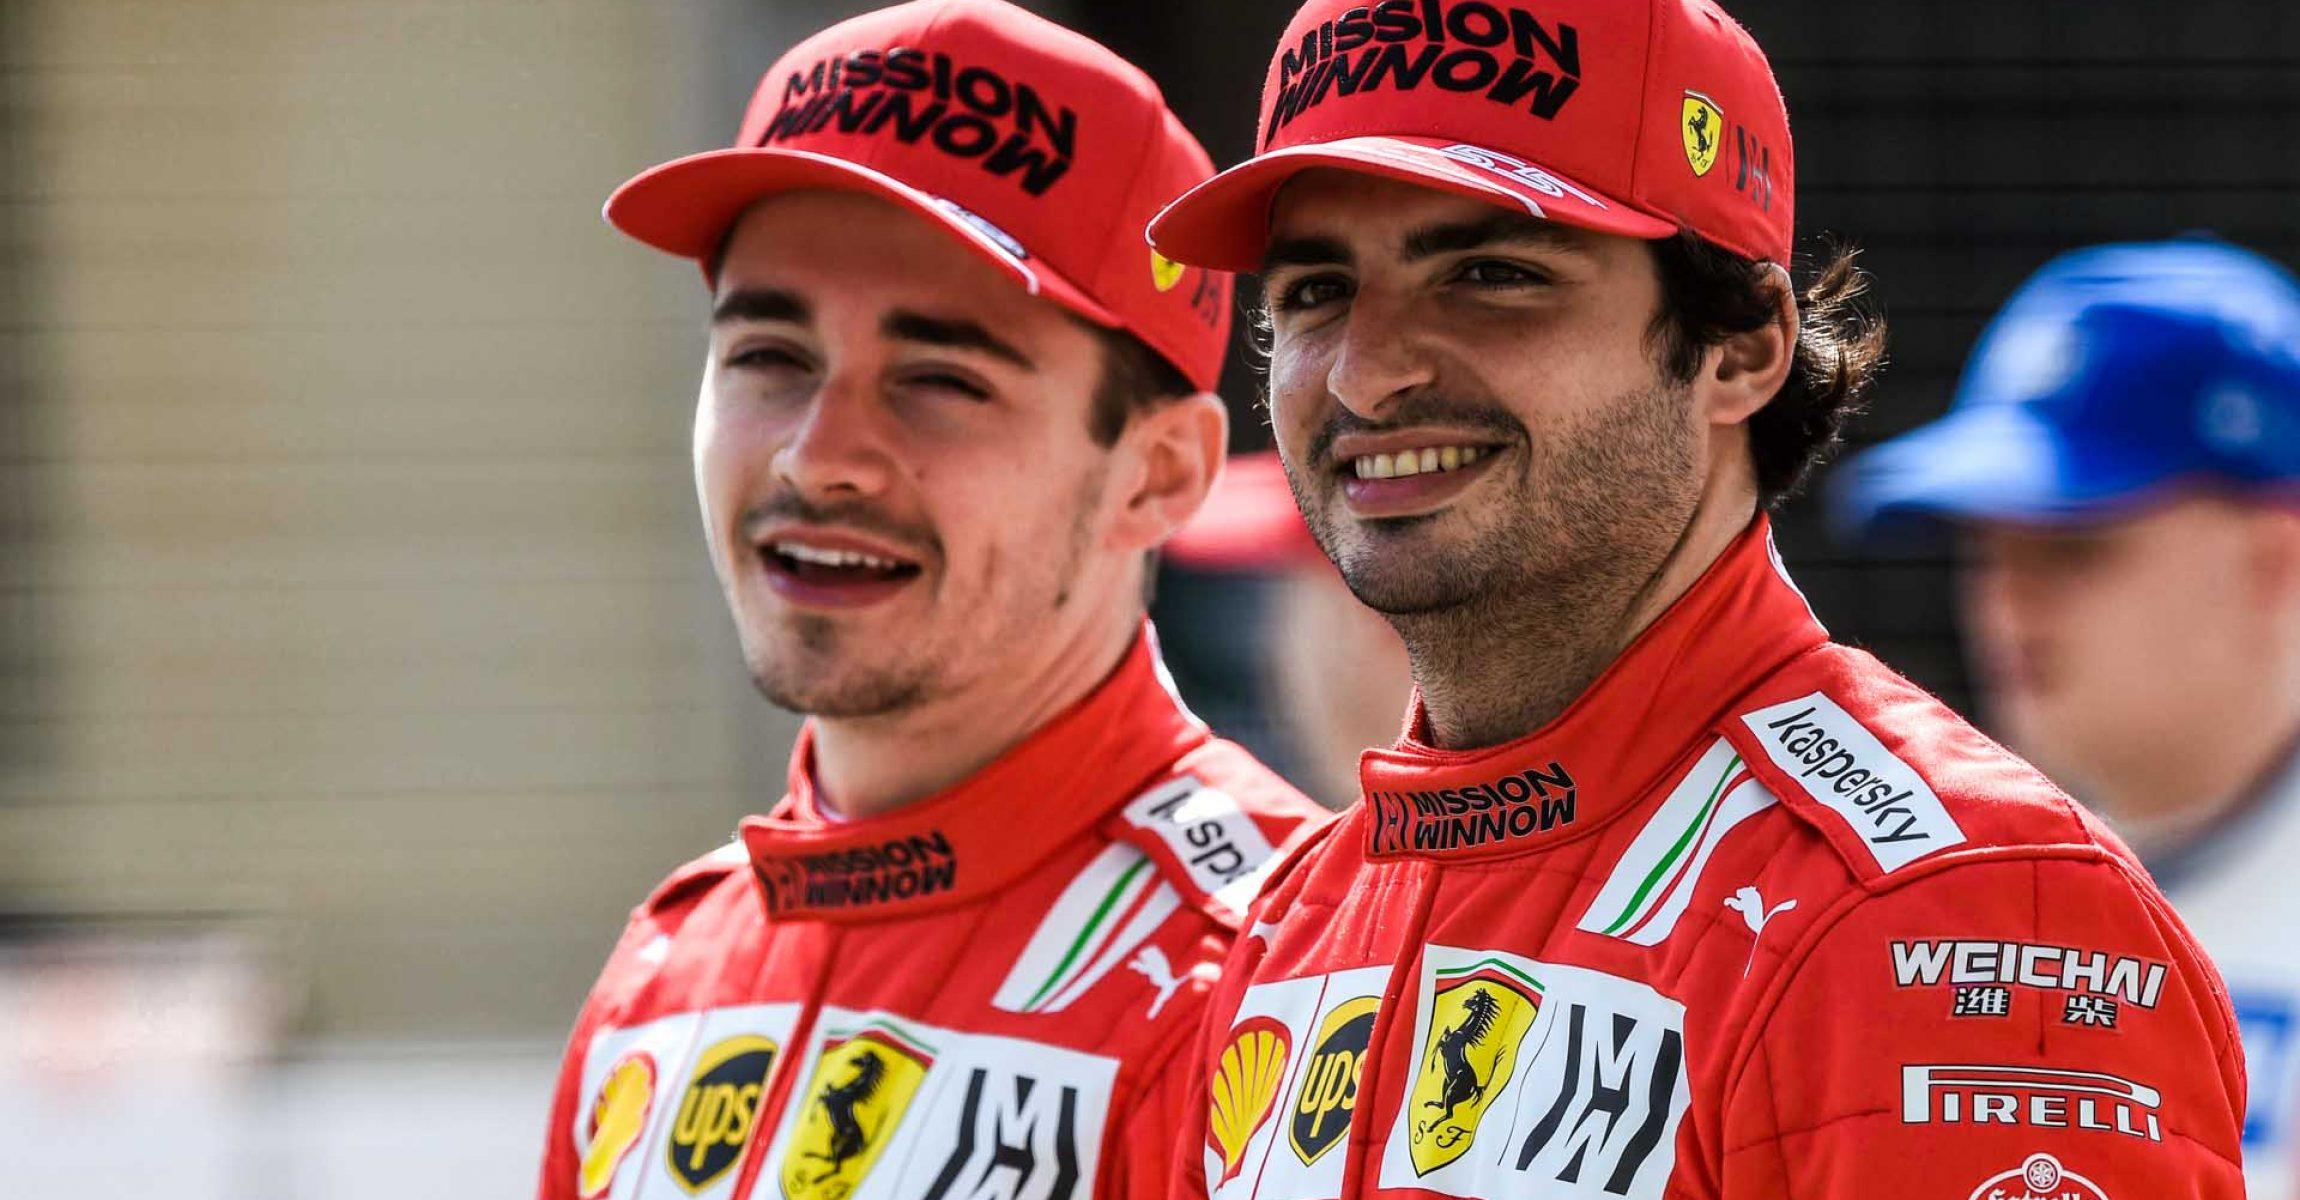 FERRARI F1 TEST BAHRAIN - VENERDI 12/03/2021  credit: @Scuderia Ferrari Press Office Charles Leclerc Carlos Sainz